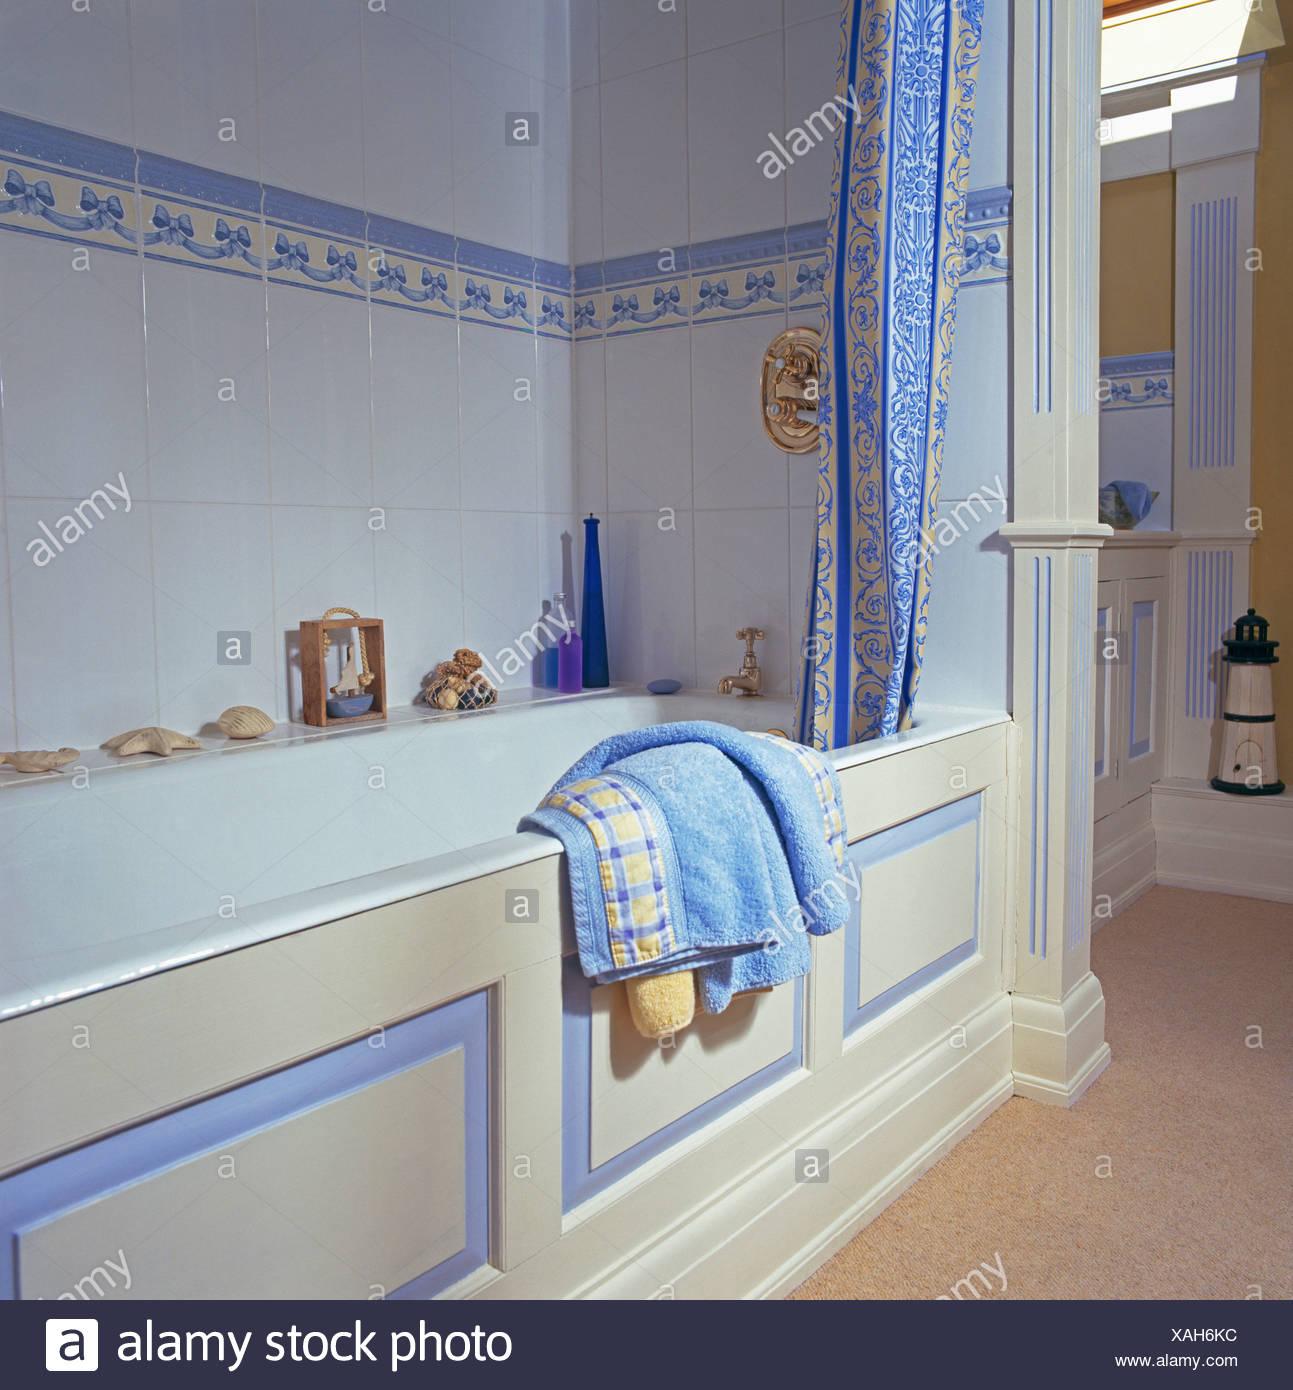 Blue Tiles Above Bath In Stock Photos & Blue Tiles Above Bath In ...